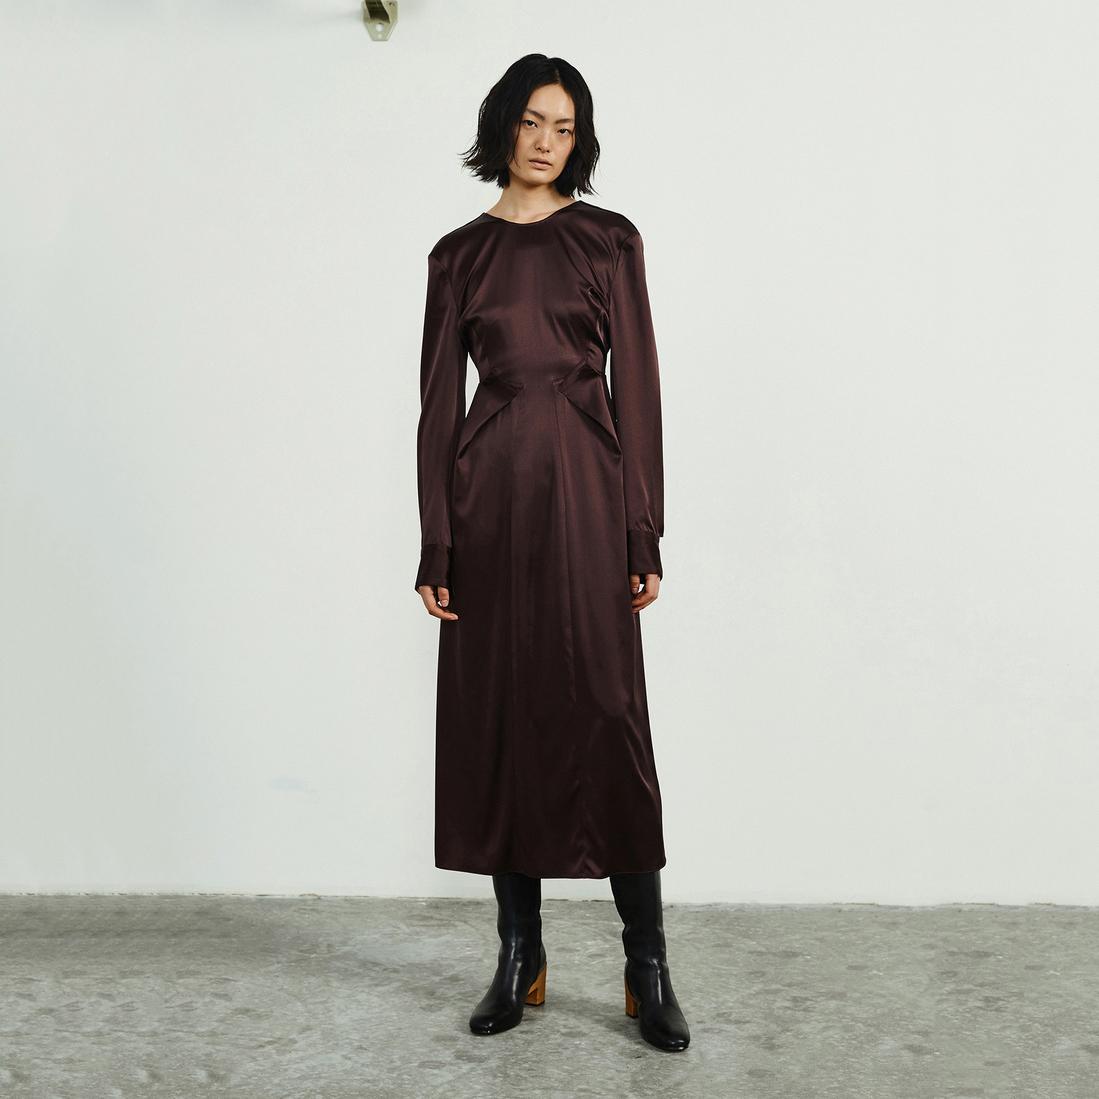 Chiffon Ruffle Maxi OEM/ODM Vestidos Women dress